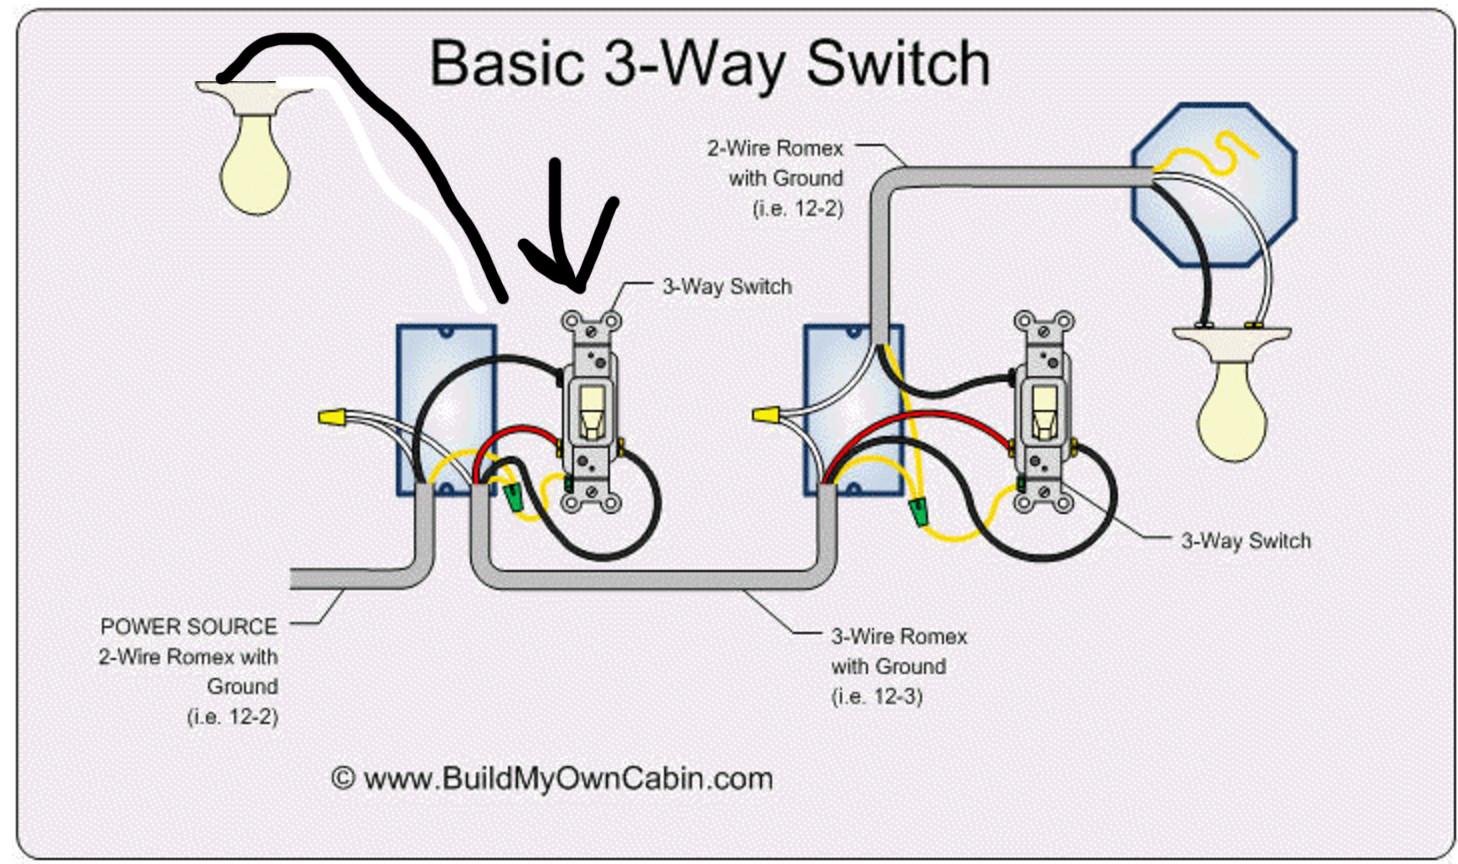 40 Way Switch Wiring Diagram Power At Switch   Novocom.top